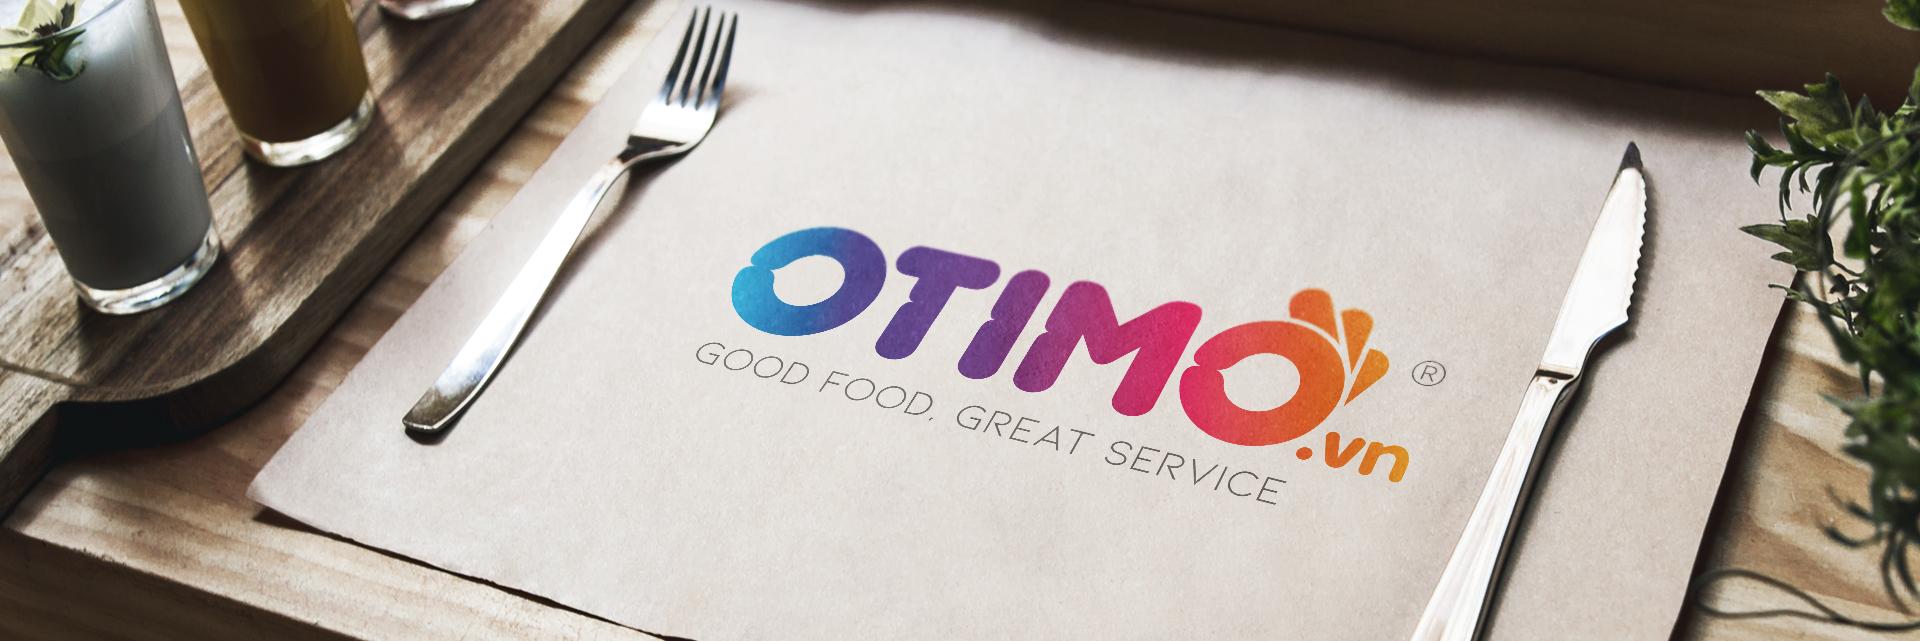 Otimo_thiet_ke_Logo_chuyen_nghiep_gia_tot_0Slide